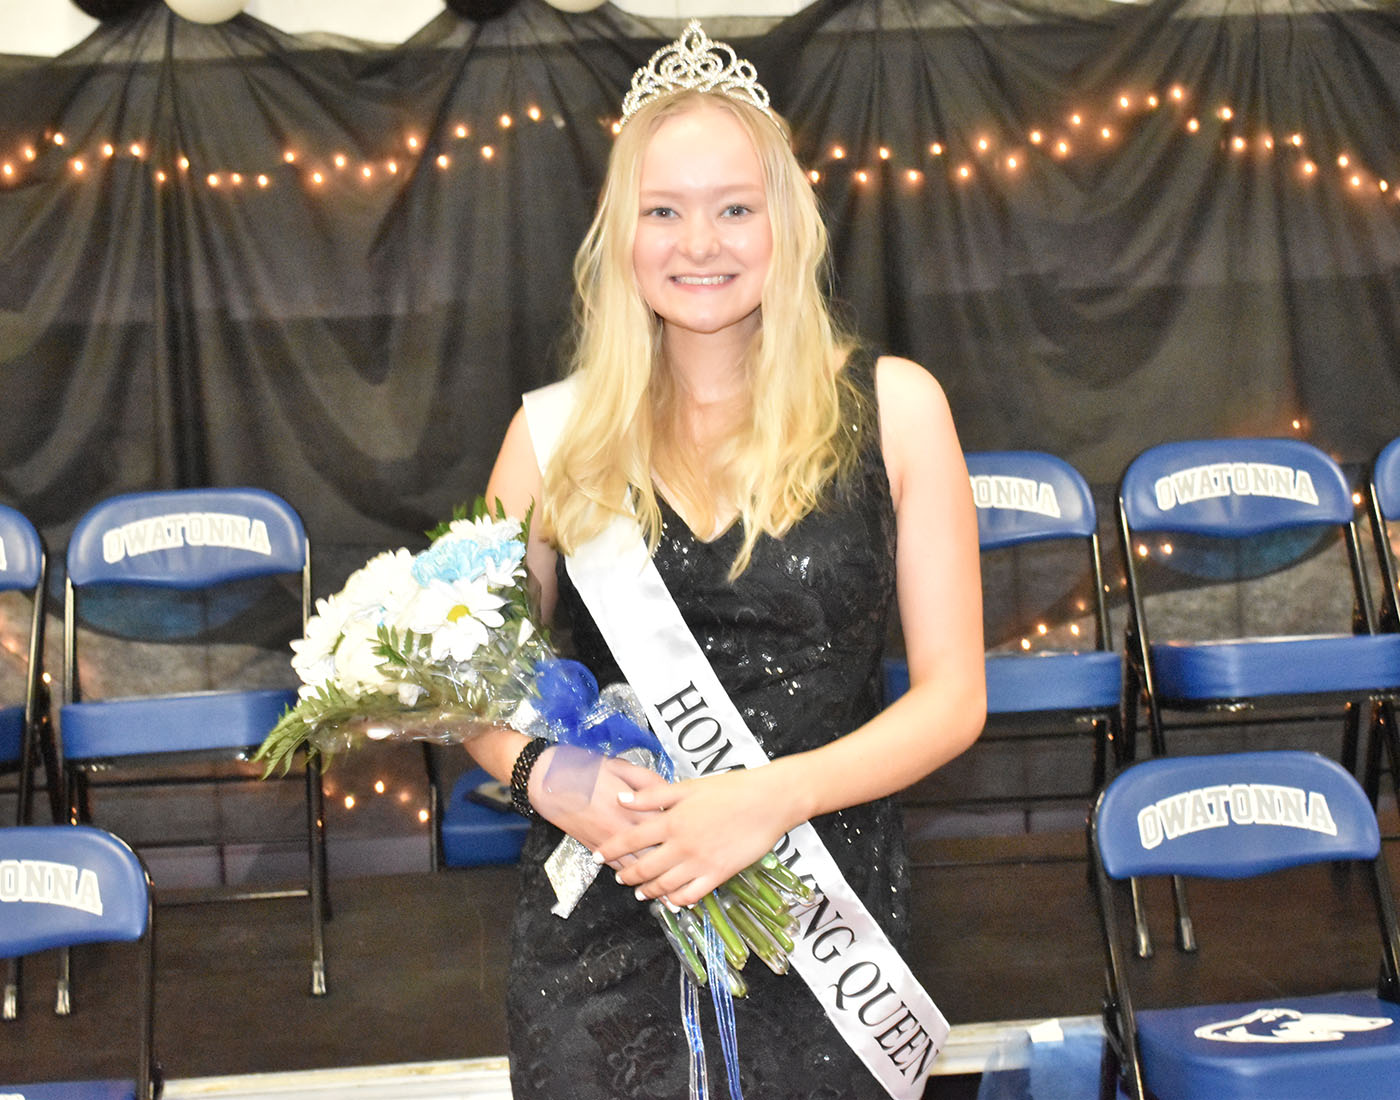 2019 OHS Homecoming Queen Julia Dallenbach